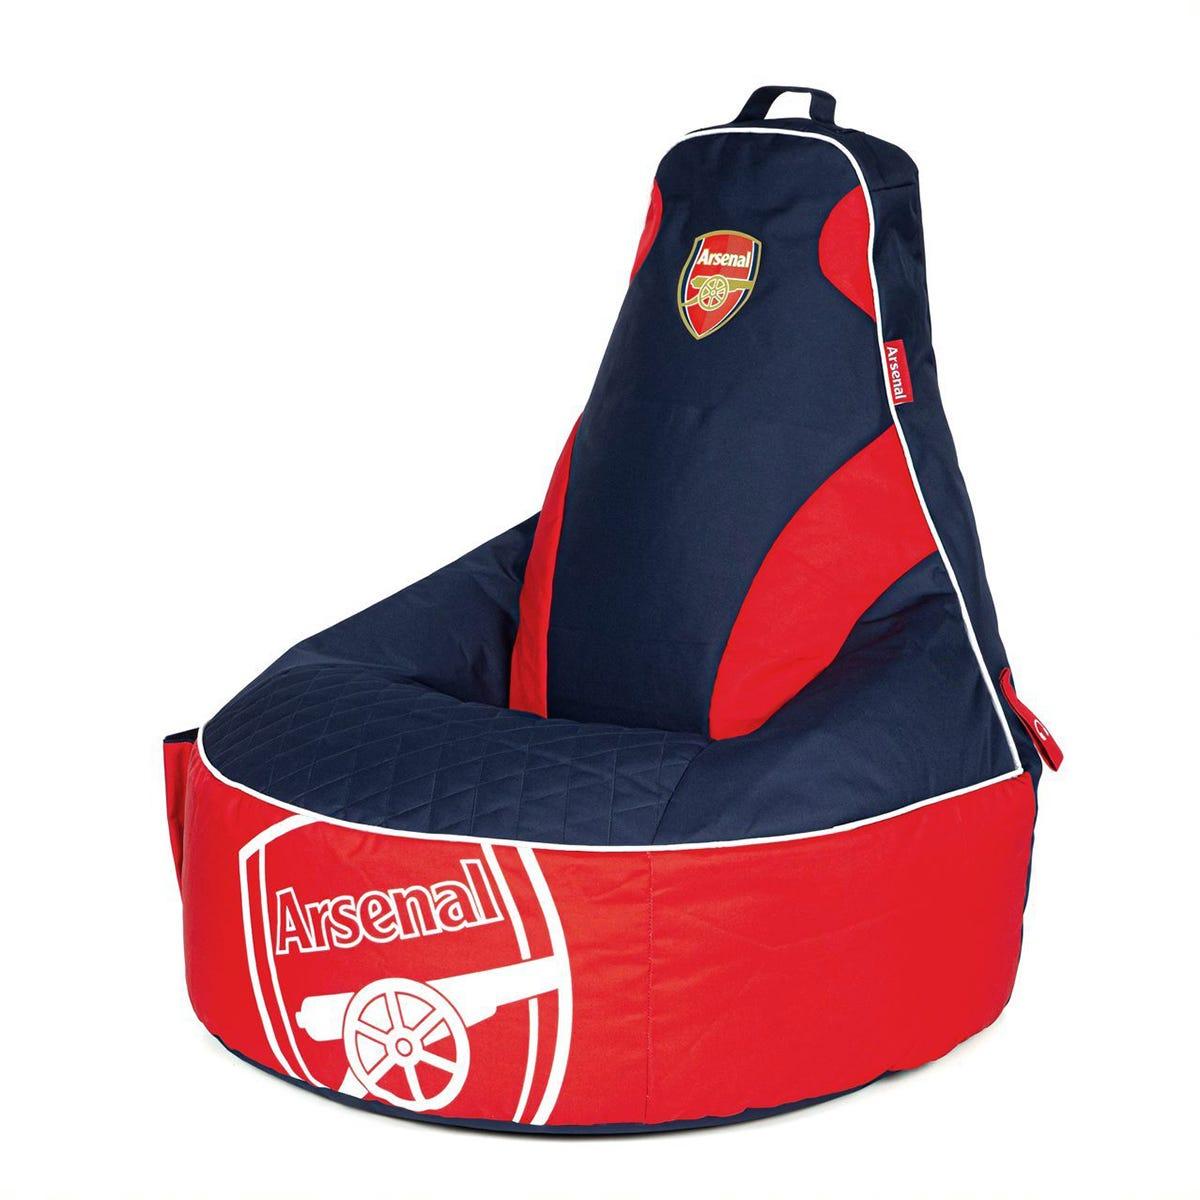 Province 5 Arsenal FC Big Chill Gaming Bean Bag Chair